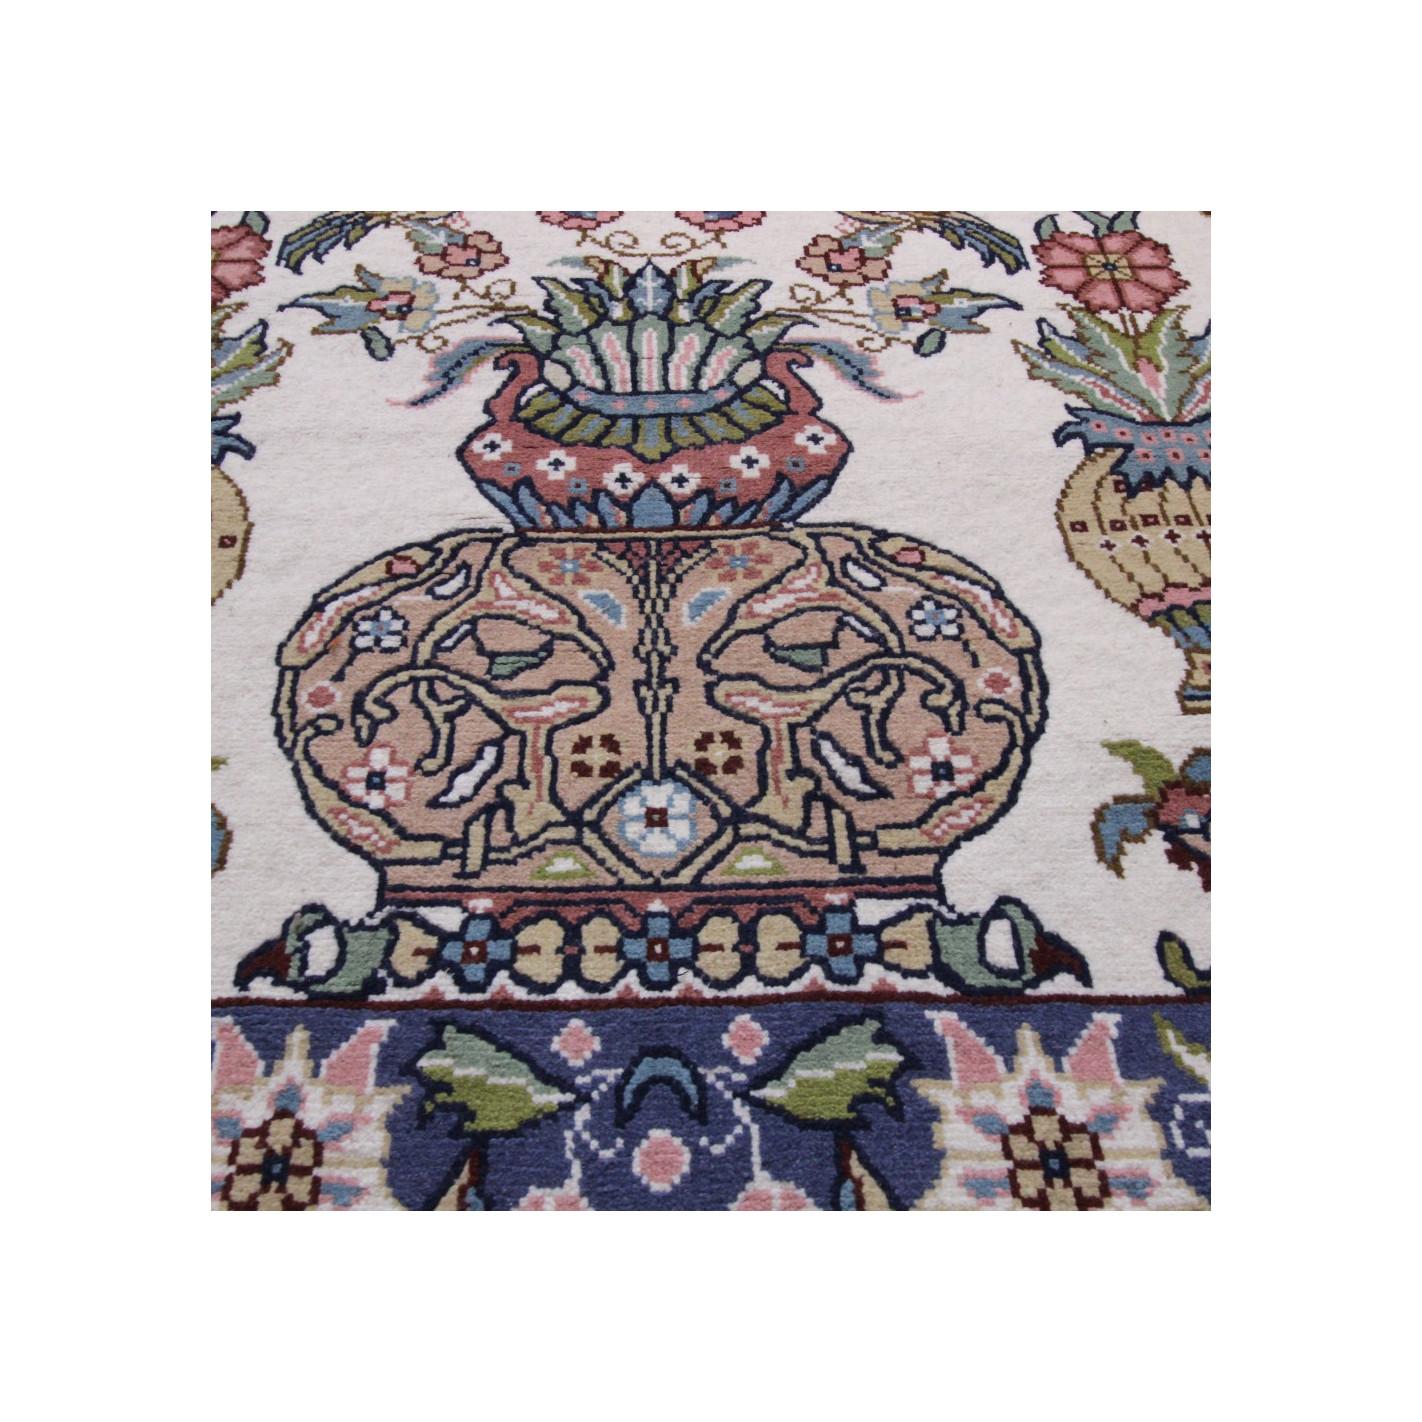 Tapis salon artisanal motif original - Salon original ...